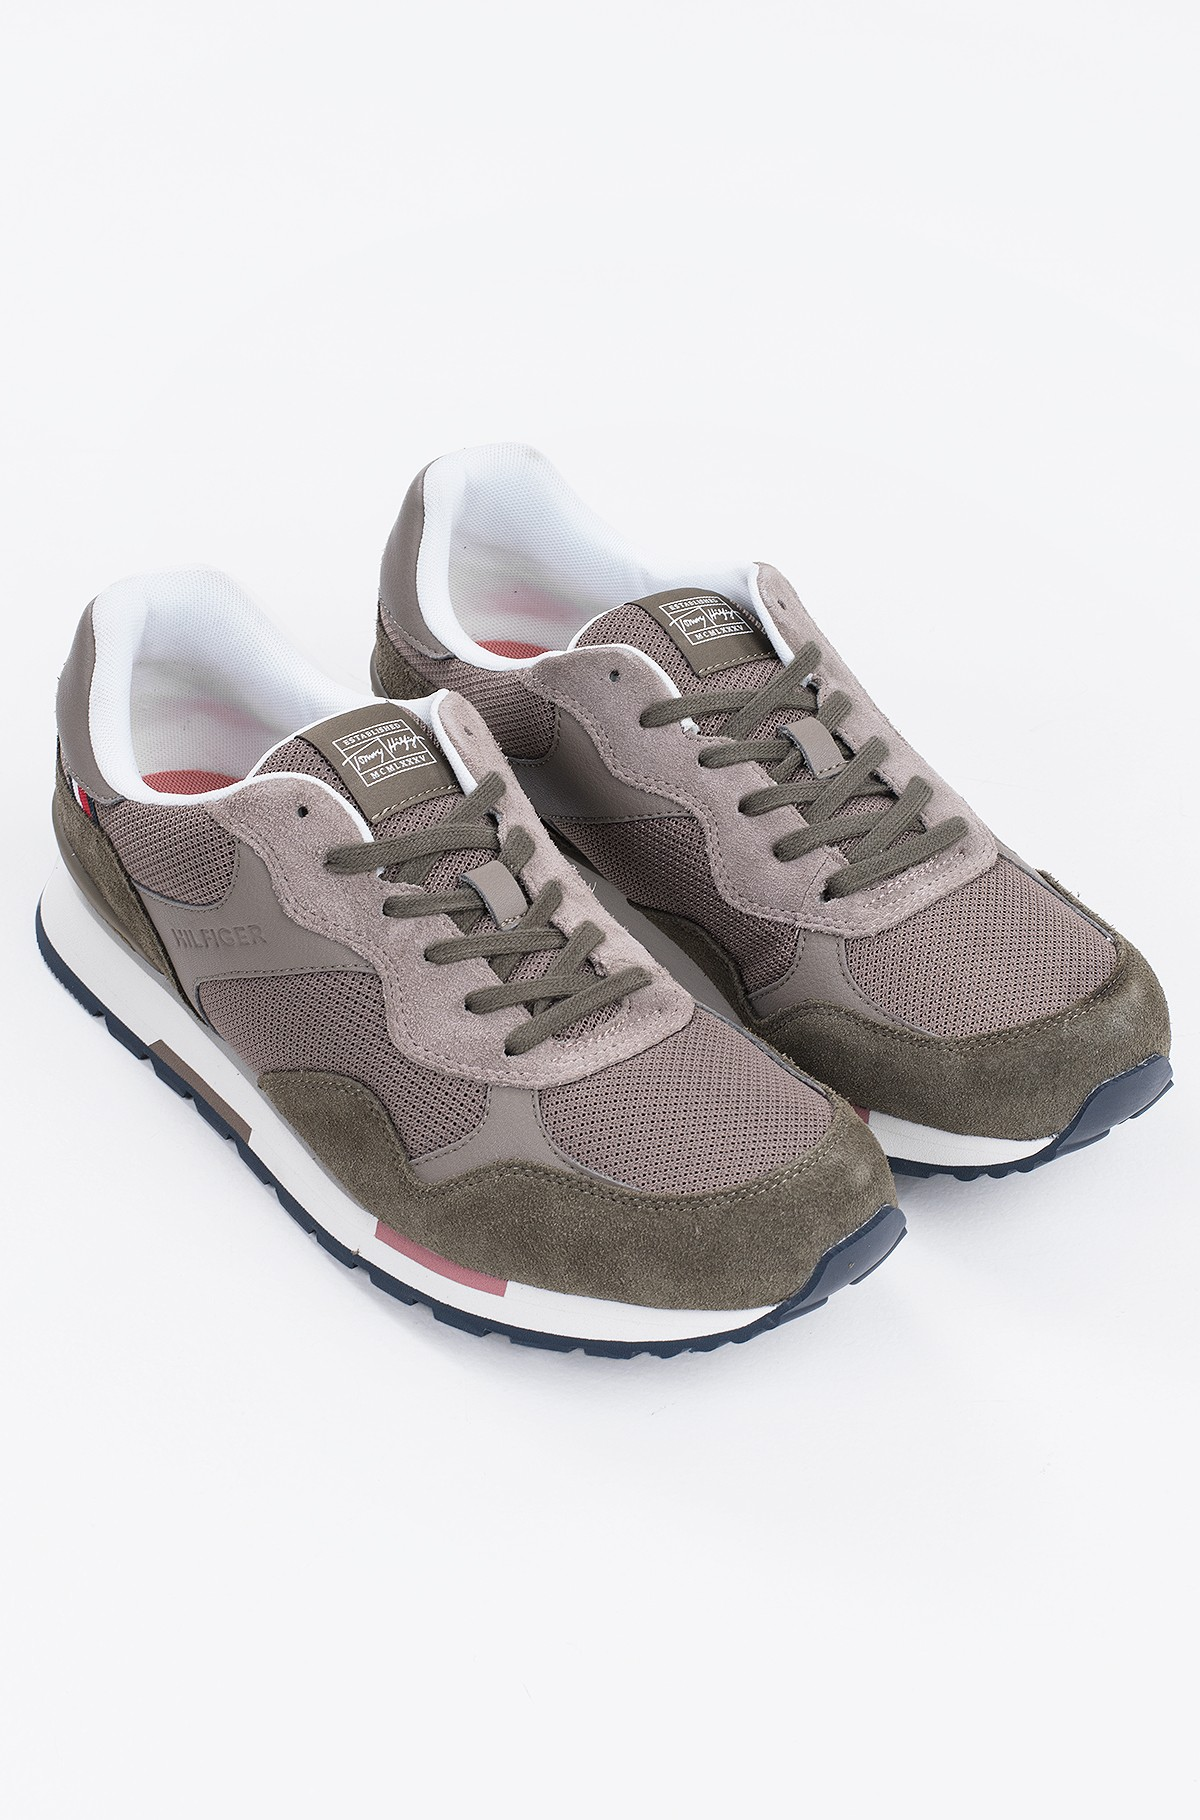 Vabaaja jalanõud RETRO RUNNER SEASONAL MIX-full-1